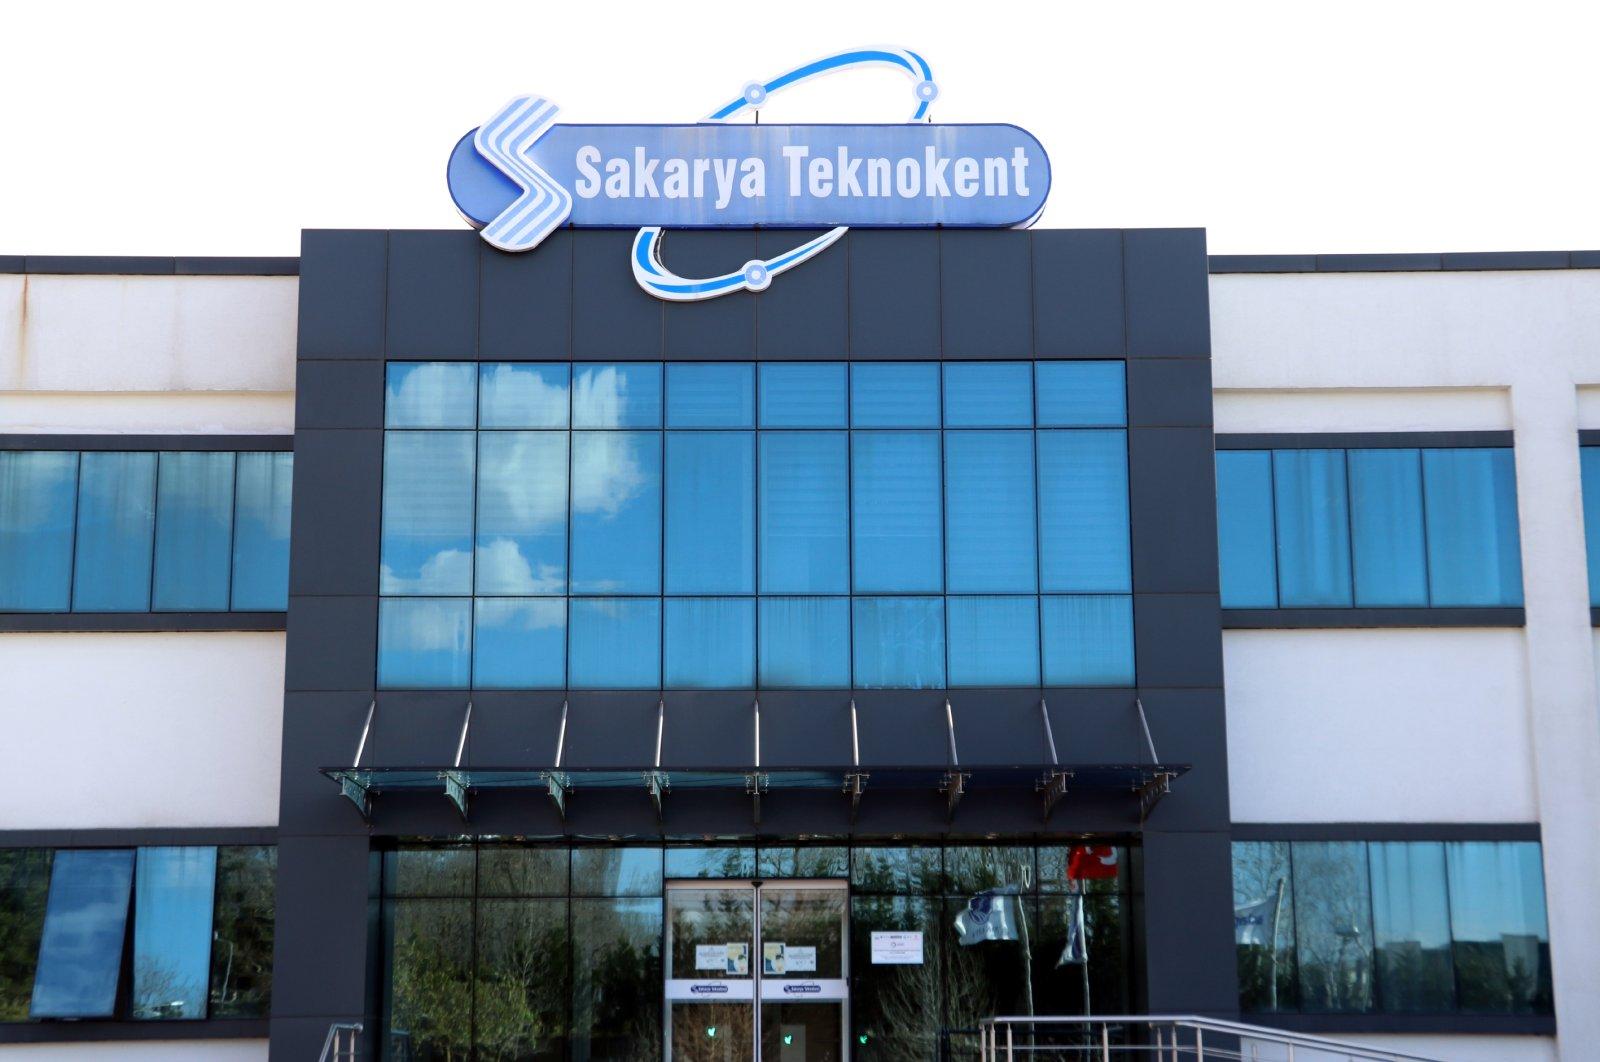 A general view of Sakarya Teknokent is seen in this file photo taken on Jan. 10, 2021. (AA Photo)